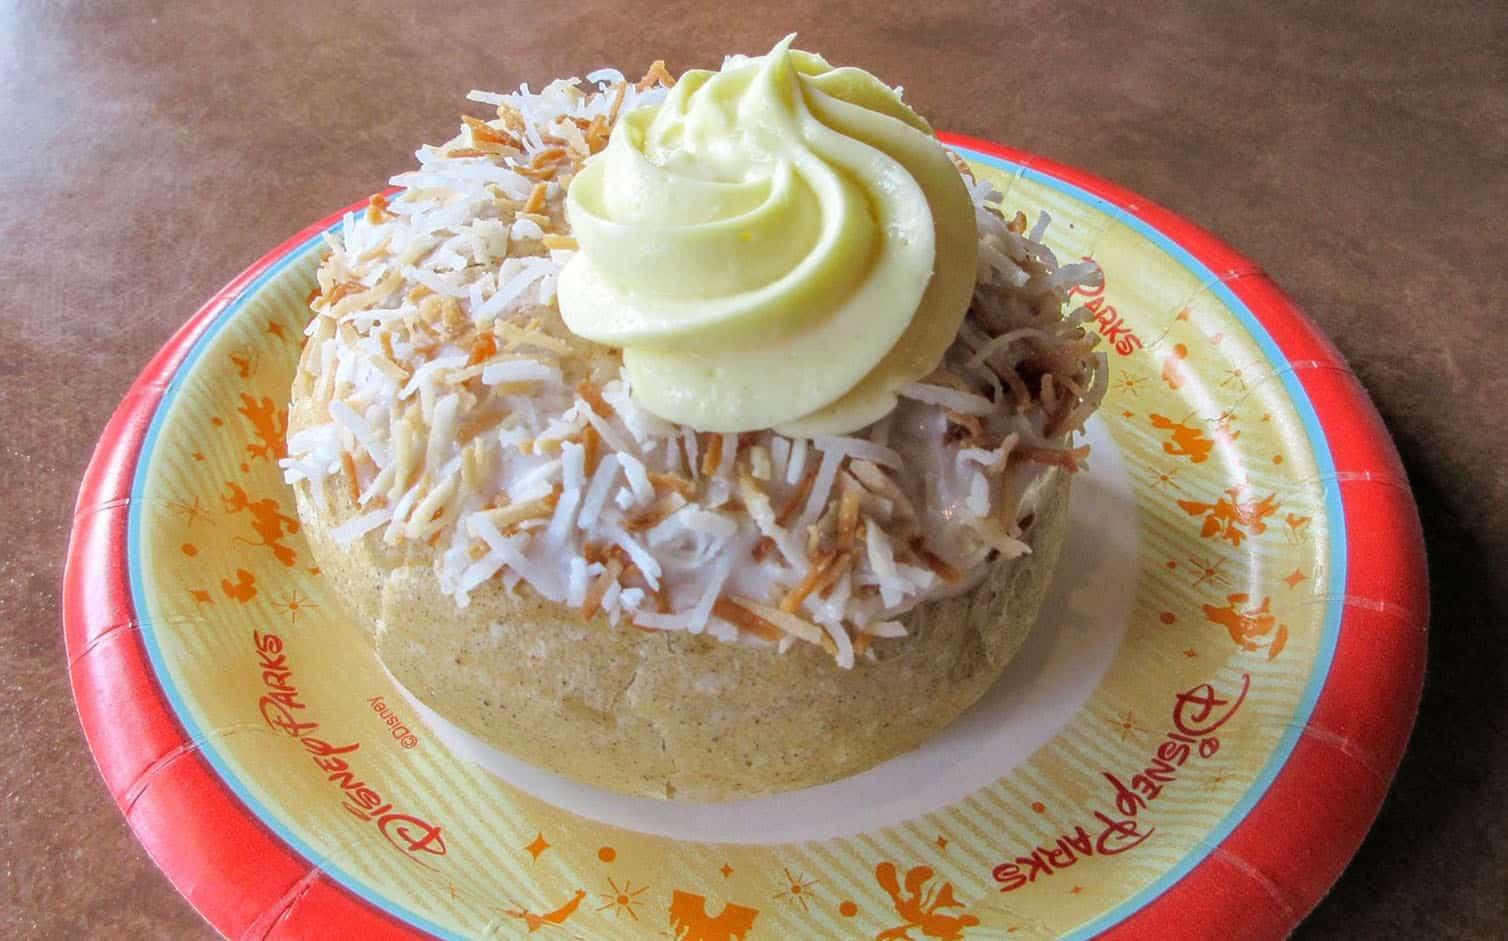 10 Best Use of Snack Credits in Walt Disney World, Florida